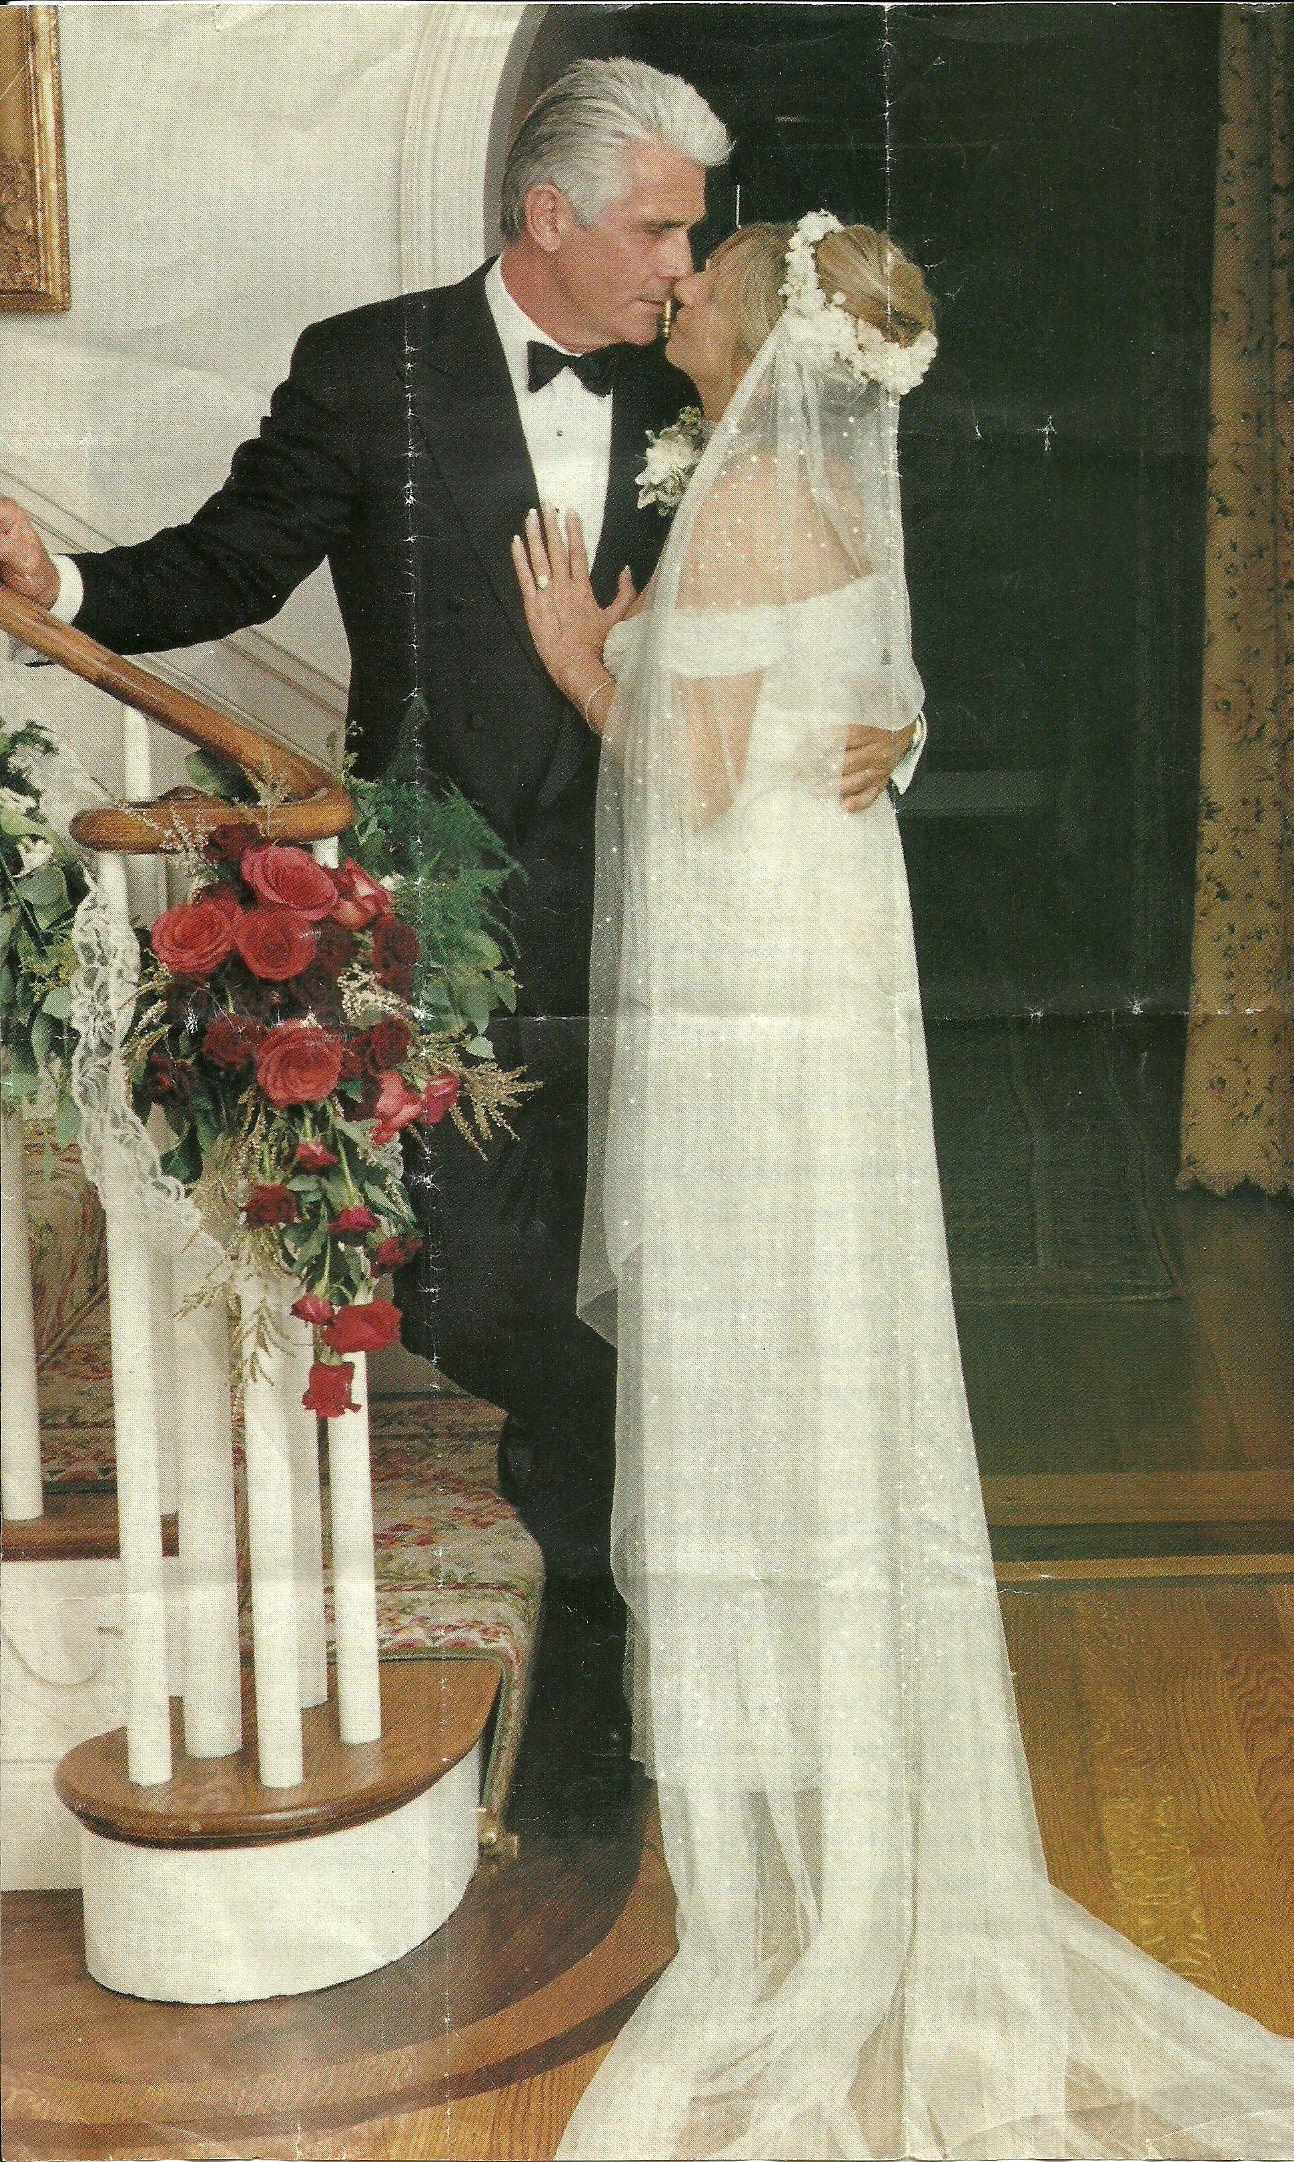 barbra streisand and james brolin wedding 1998 love this